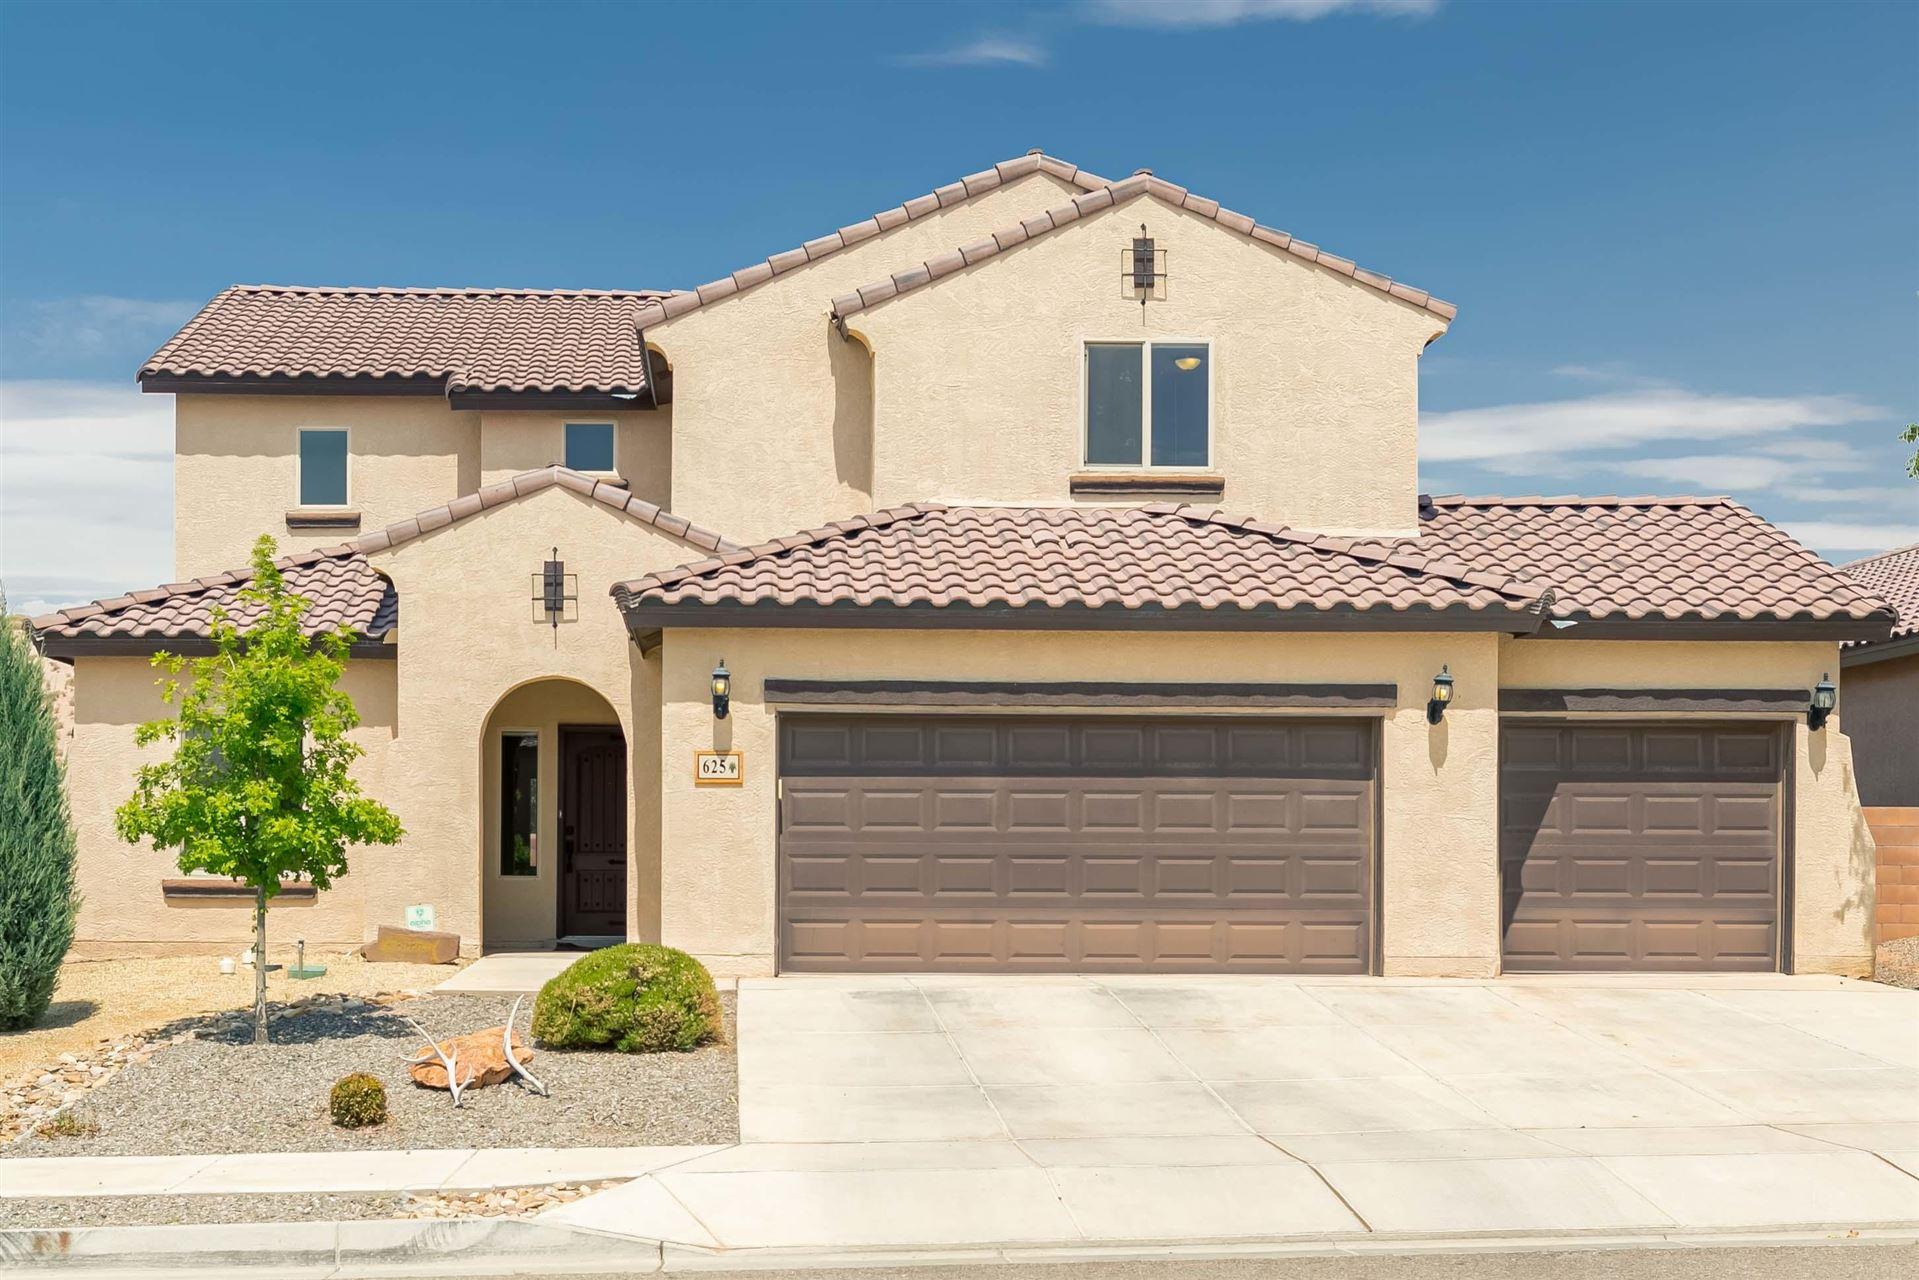 625 PALO ALTO Drive NE, Rio Rancho, NM 87124 - #: 997697